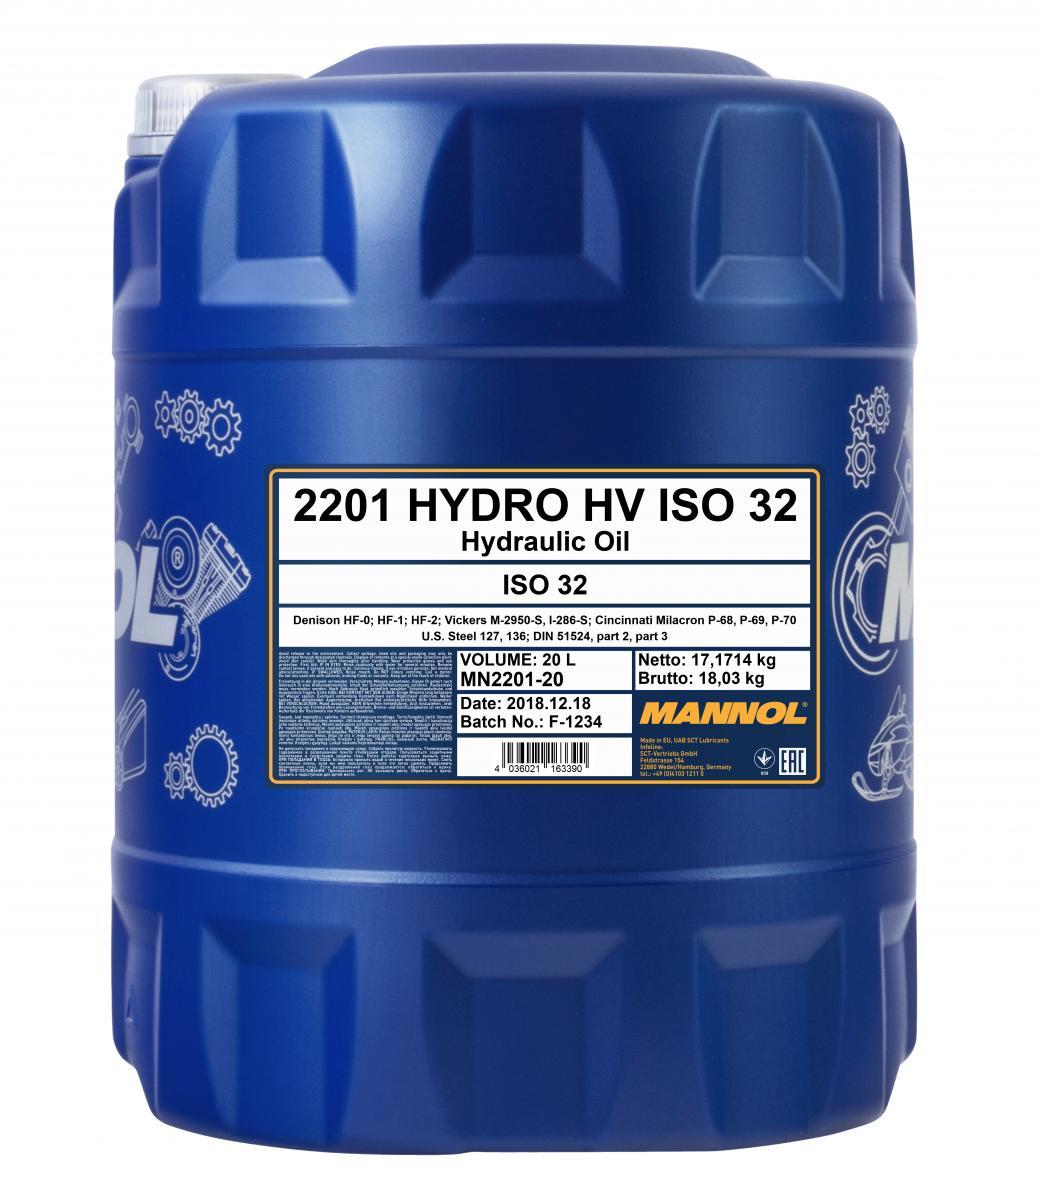 Hydro HV ISO 32